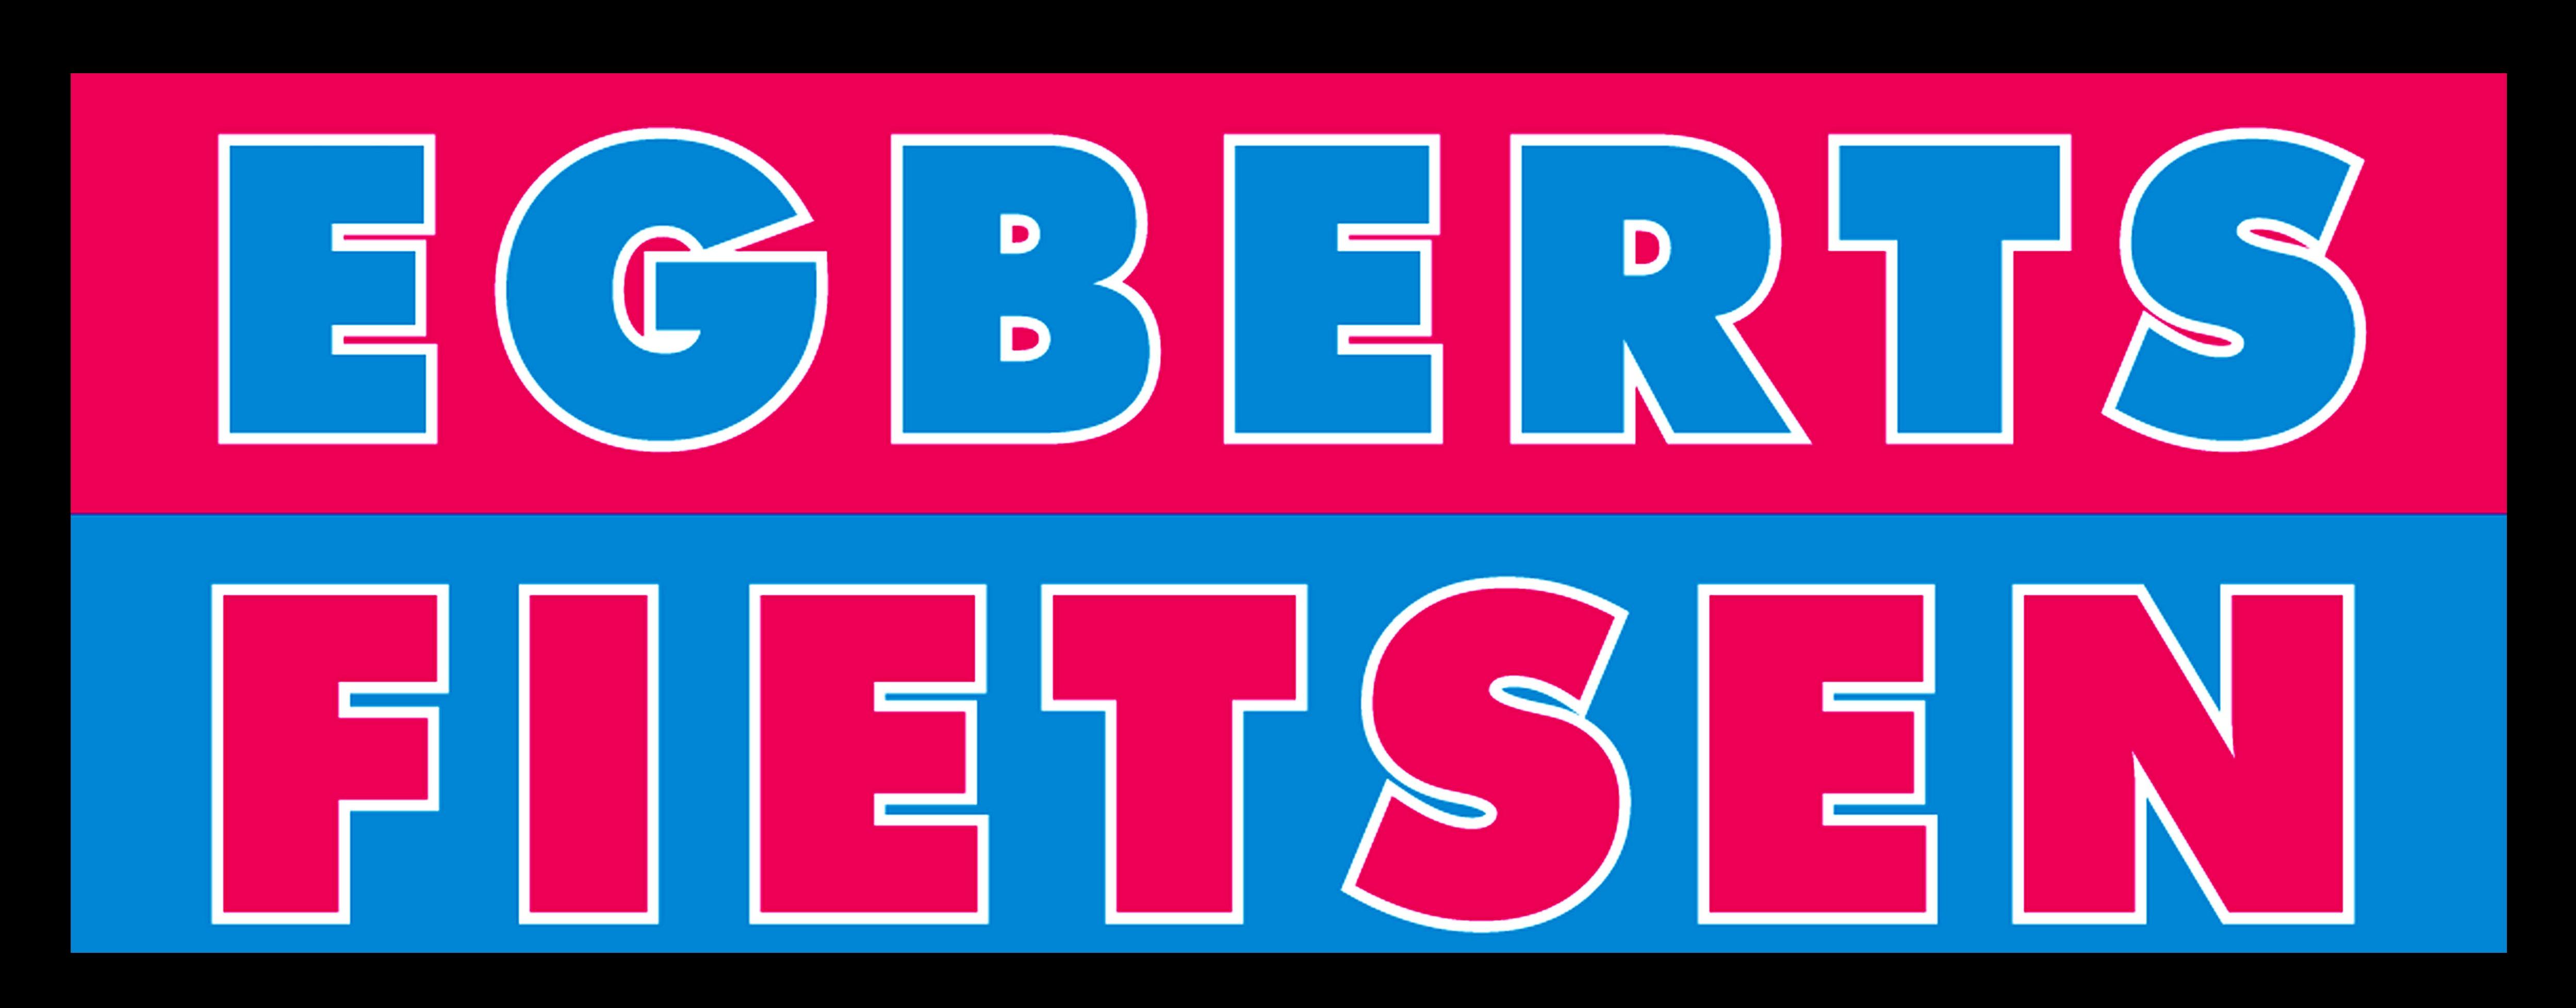 Egberts Fietsen